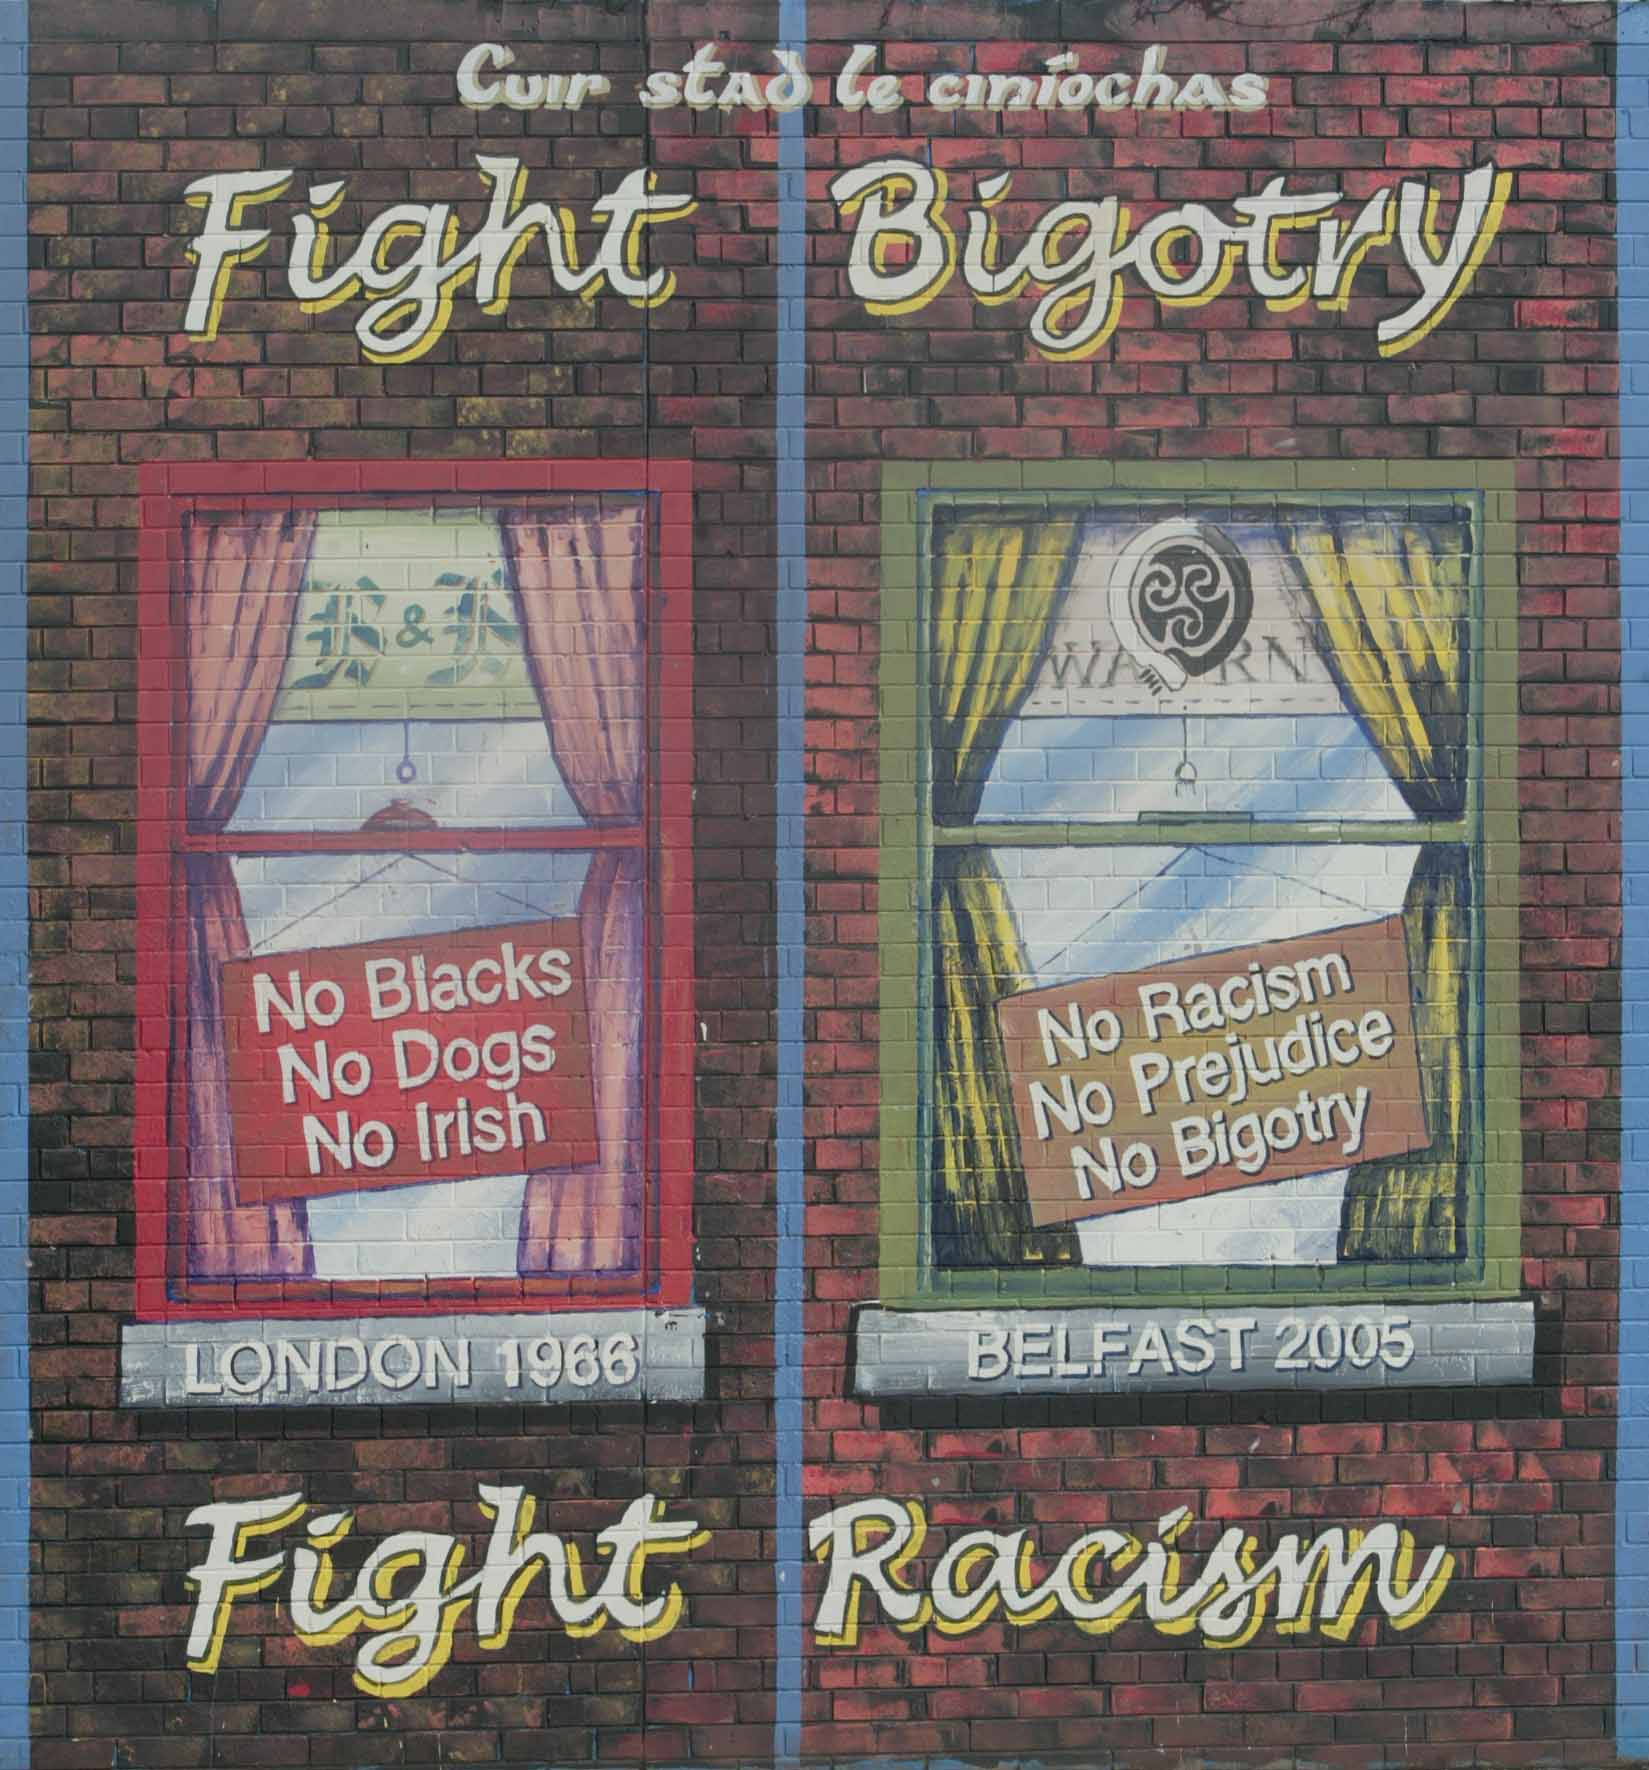 WARN Fight Bigotry Fight Racism Mural